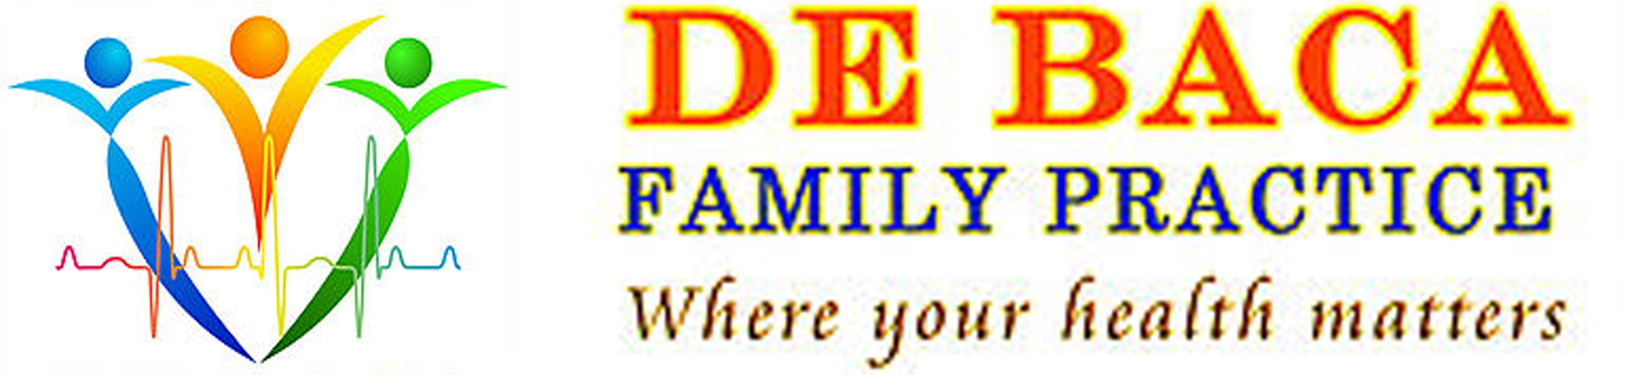 De Baca Family Practice